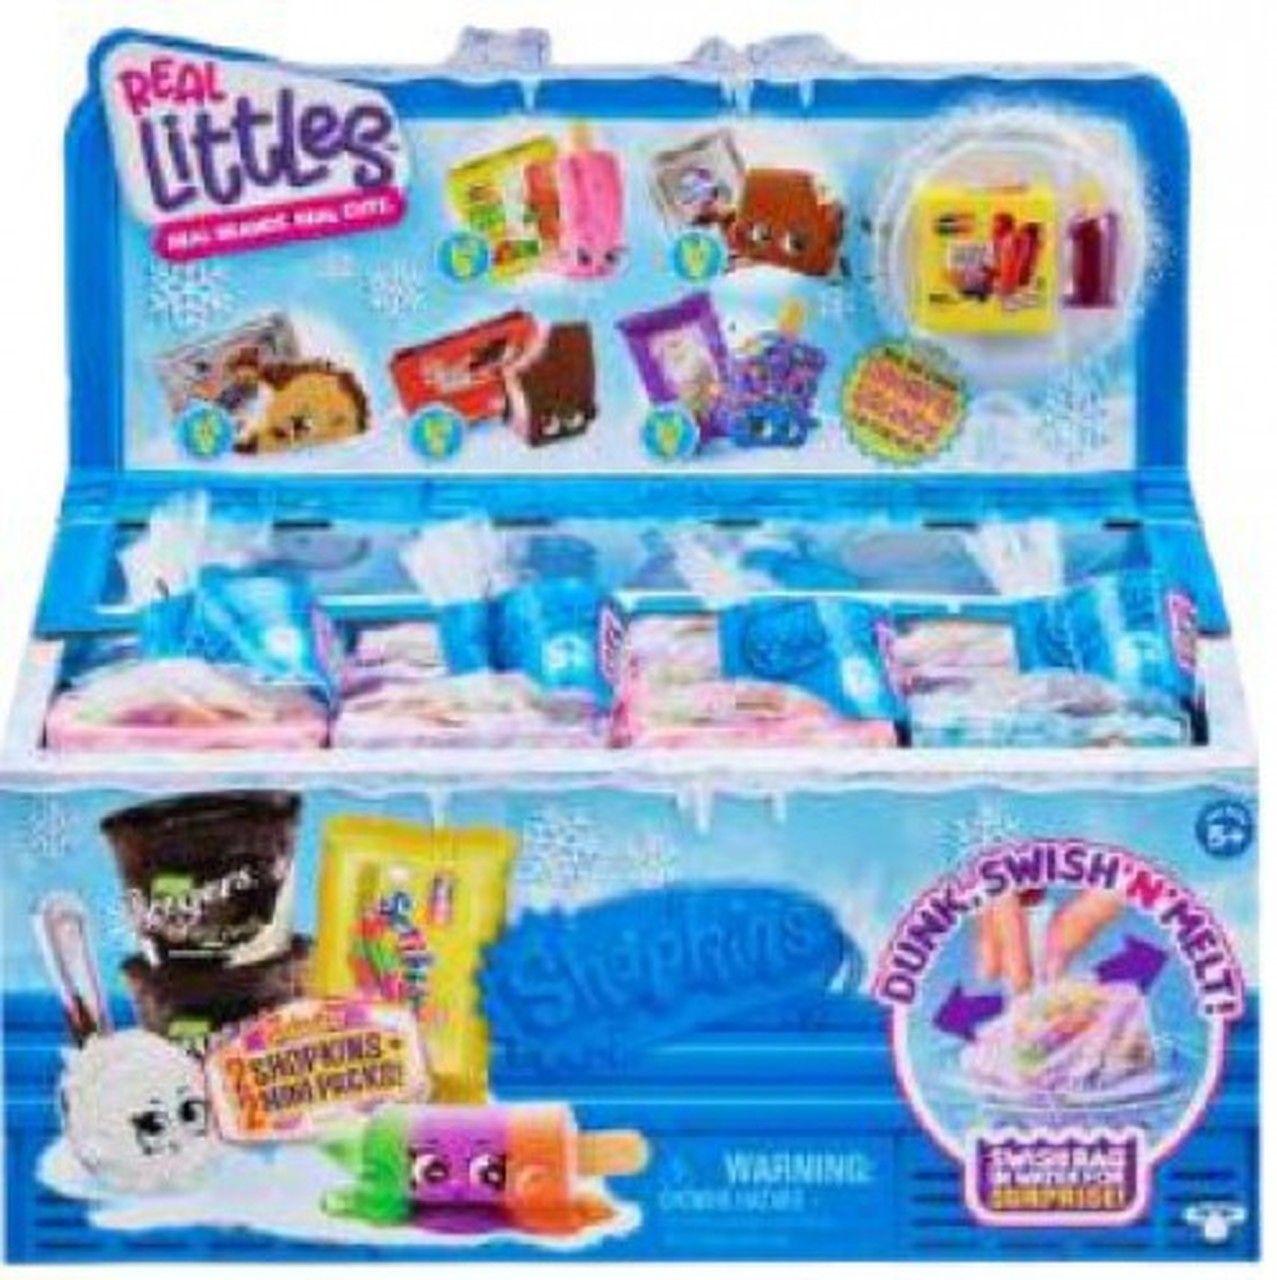 2 Lil Shopper Packs REAL LITTLES Season 13 Frozen Brands 16 Shopkins 16 Minis